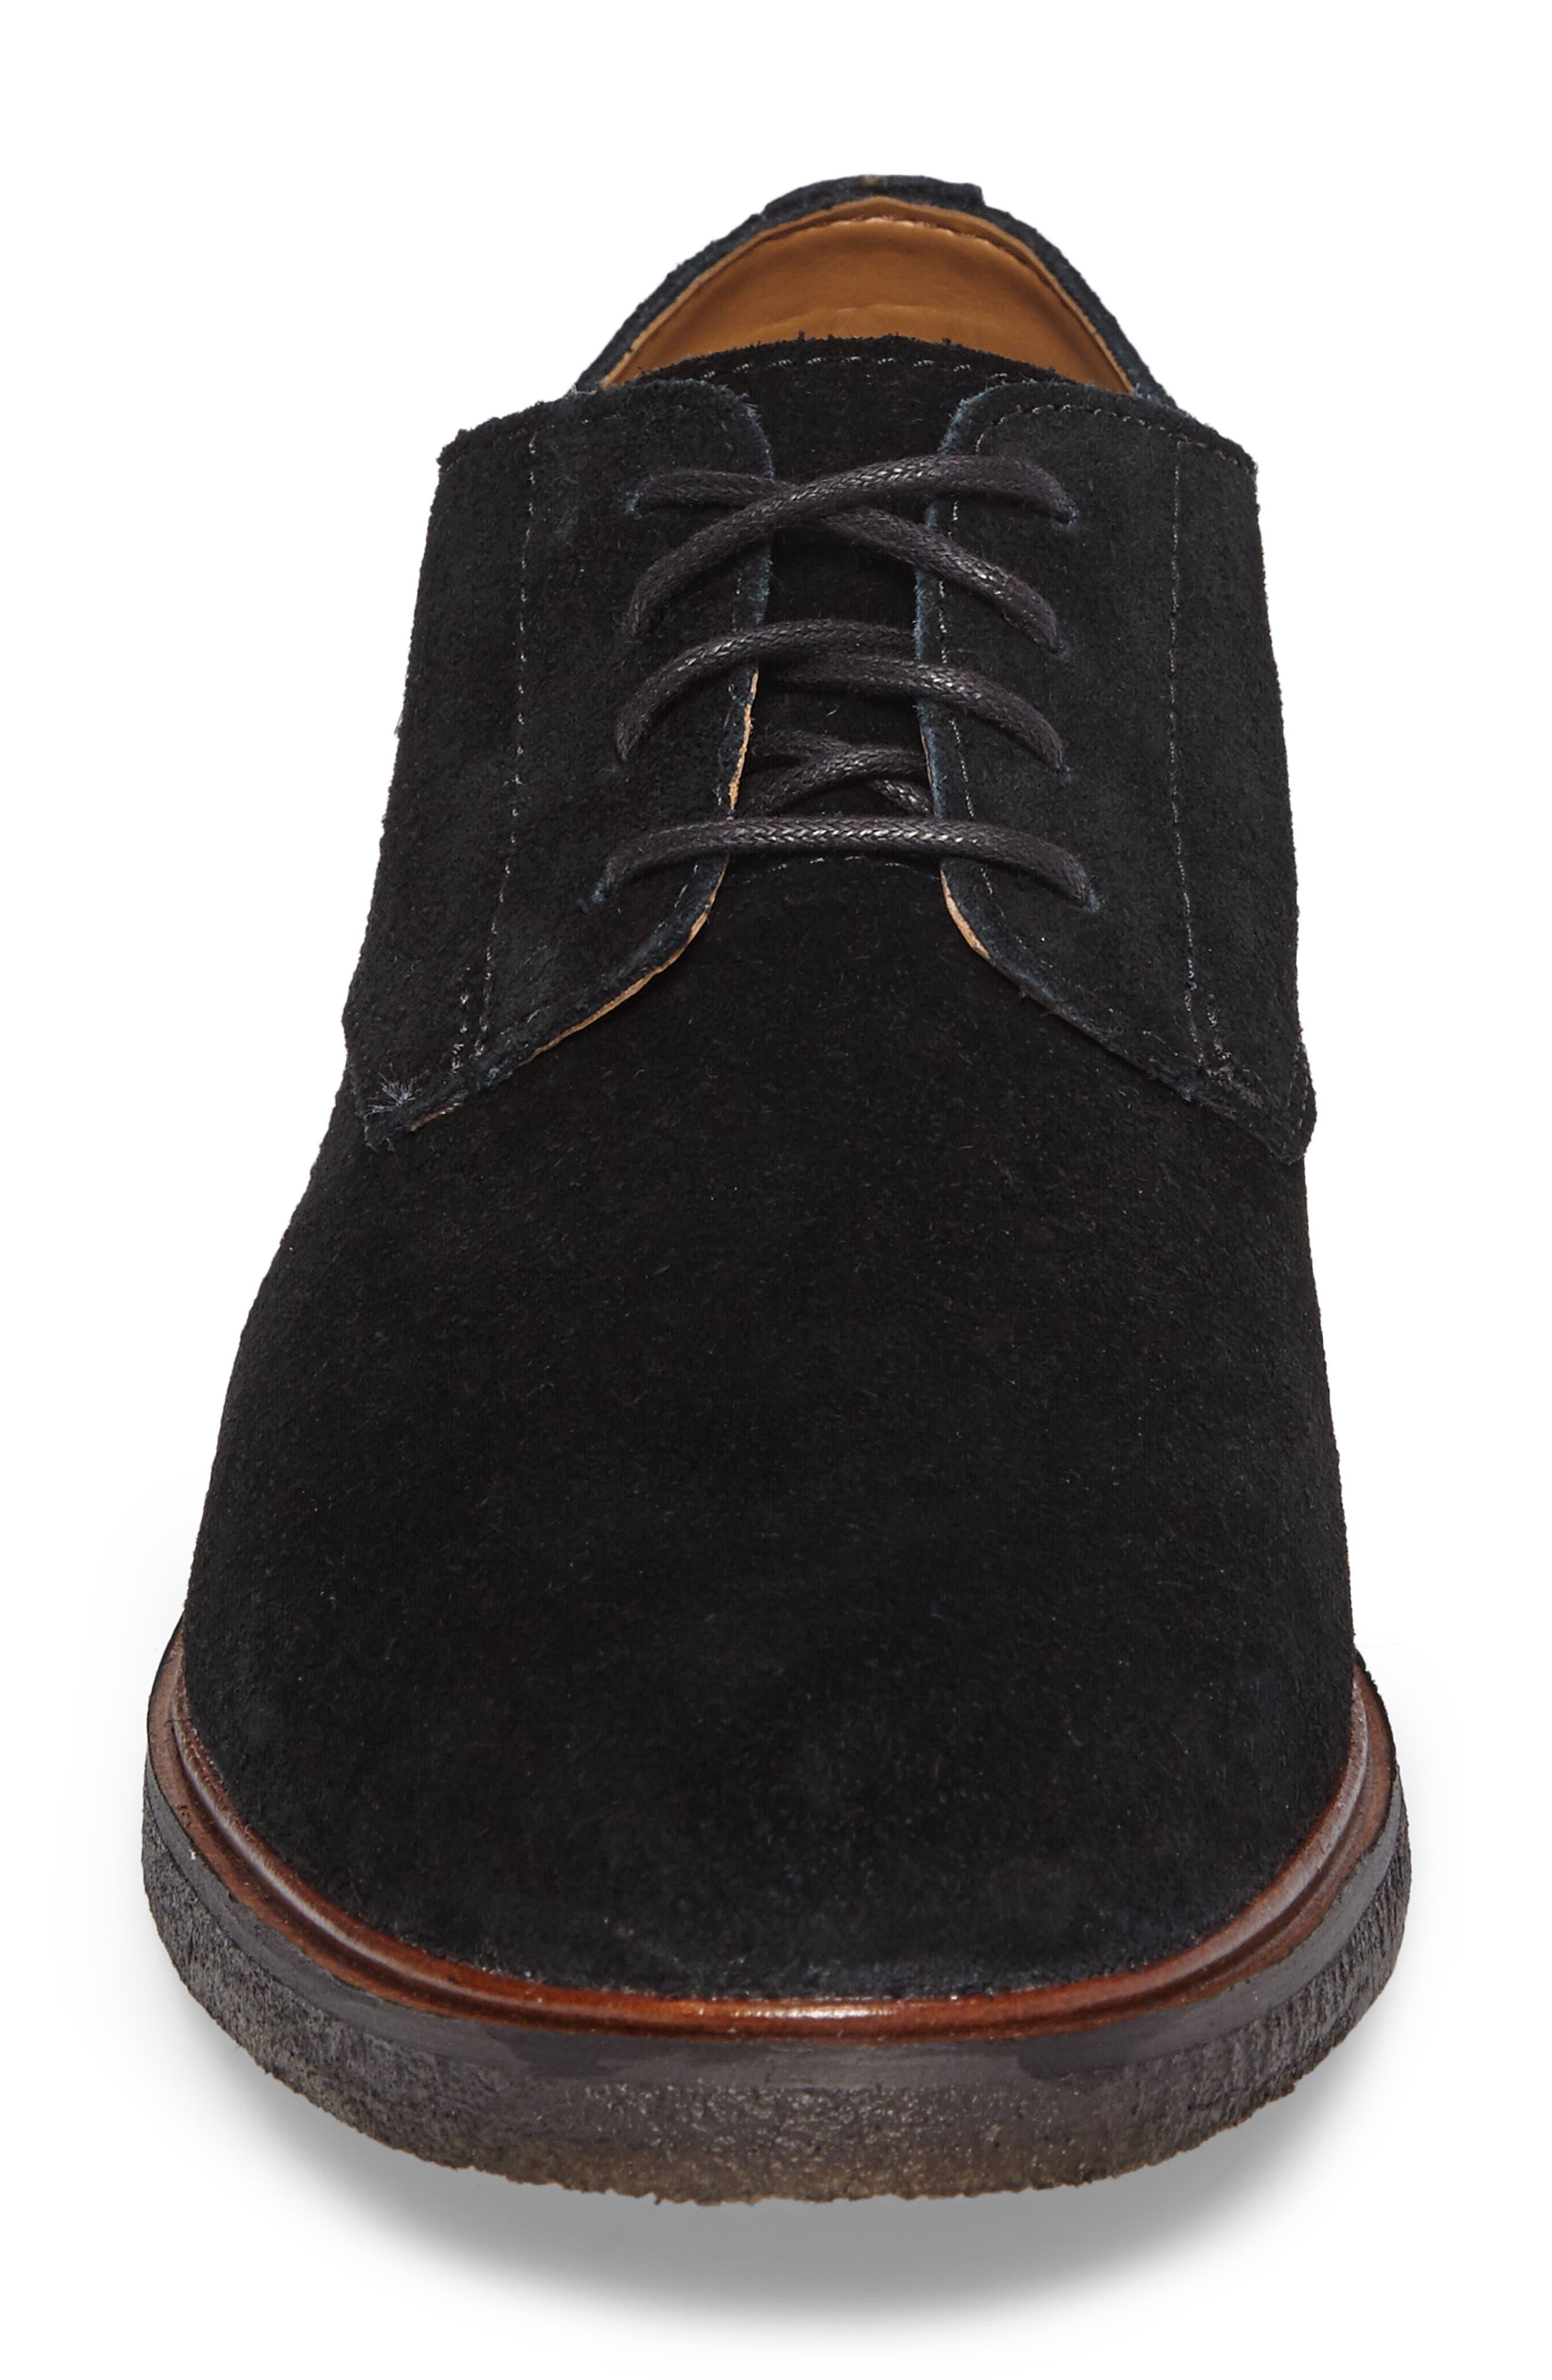 Clarks Clarkdale Moon Buck Shoe,                             Alternate thumbnail 4, color,                             Black Suede